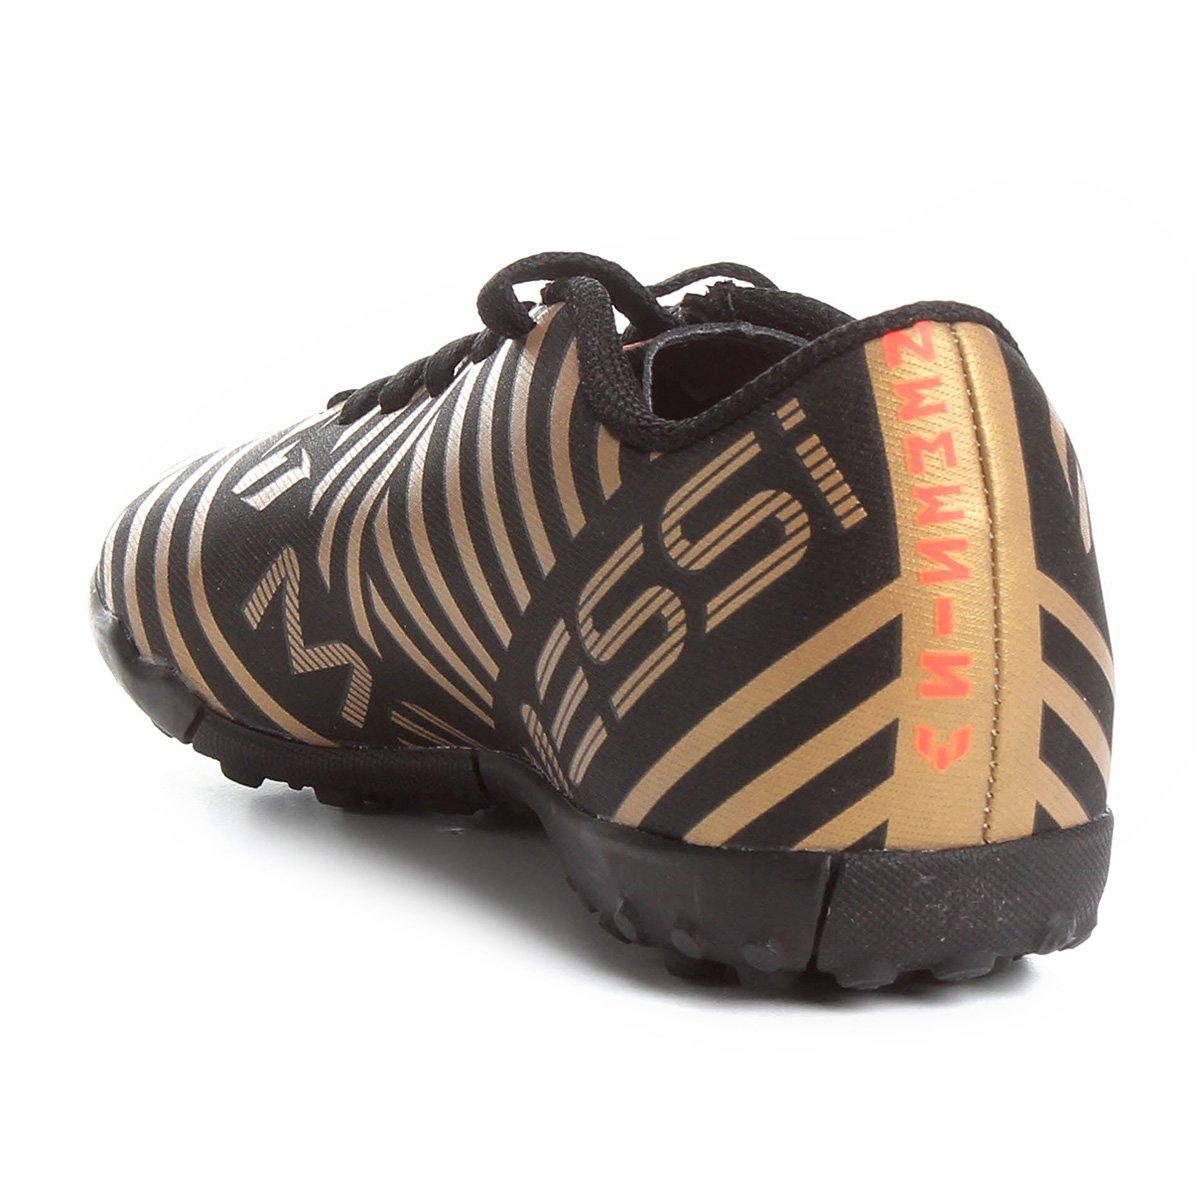 3dcd1f6bd6 Chuteira Society Adidas Nemezis Messi 17 4 TF Infantil - Compre ...